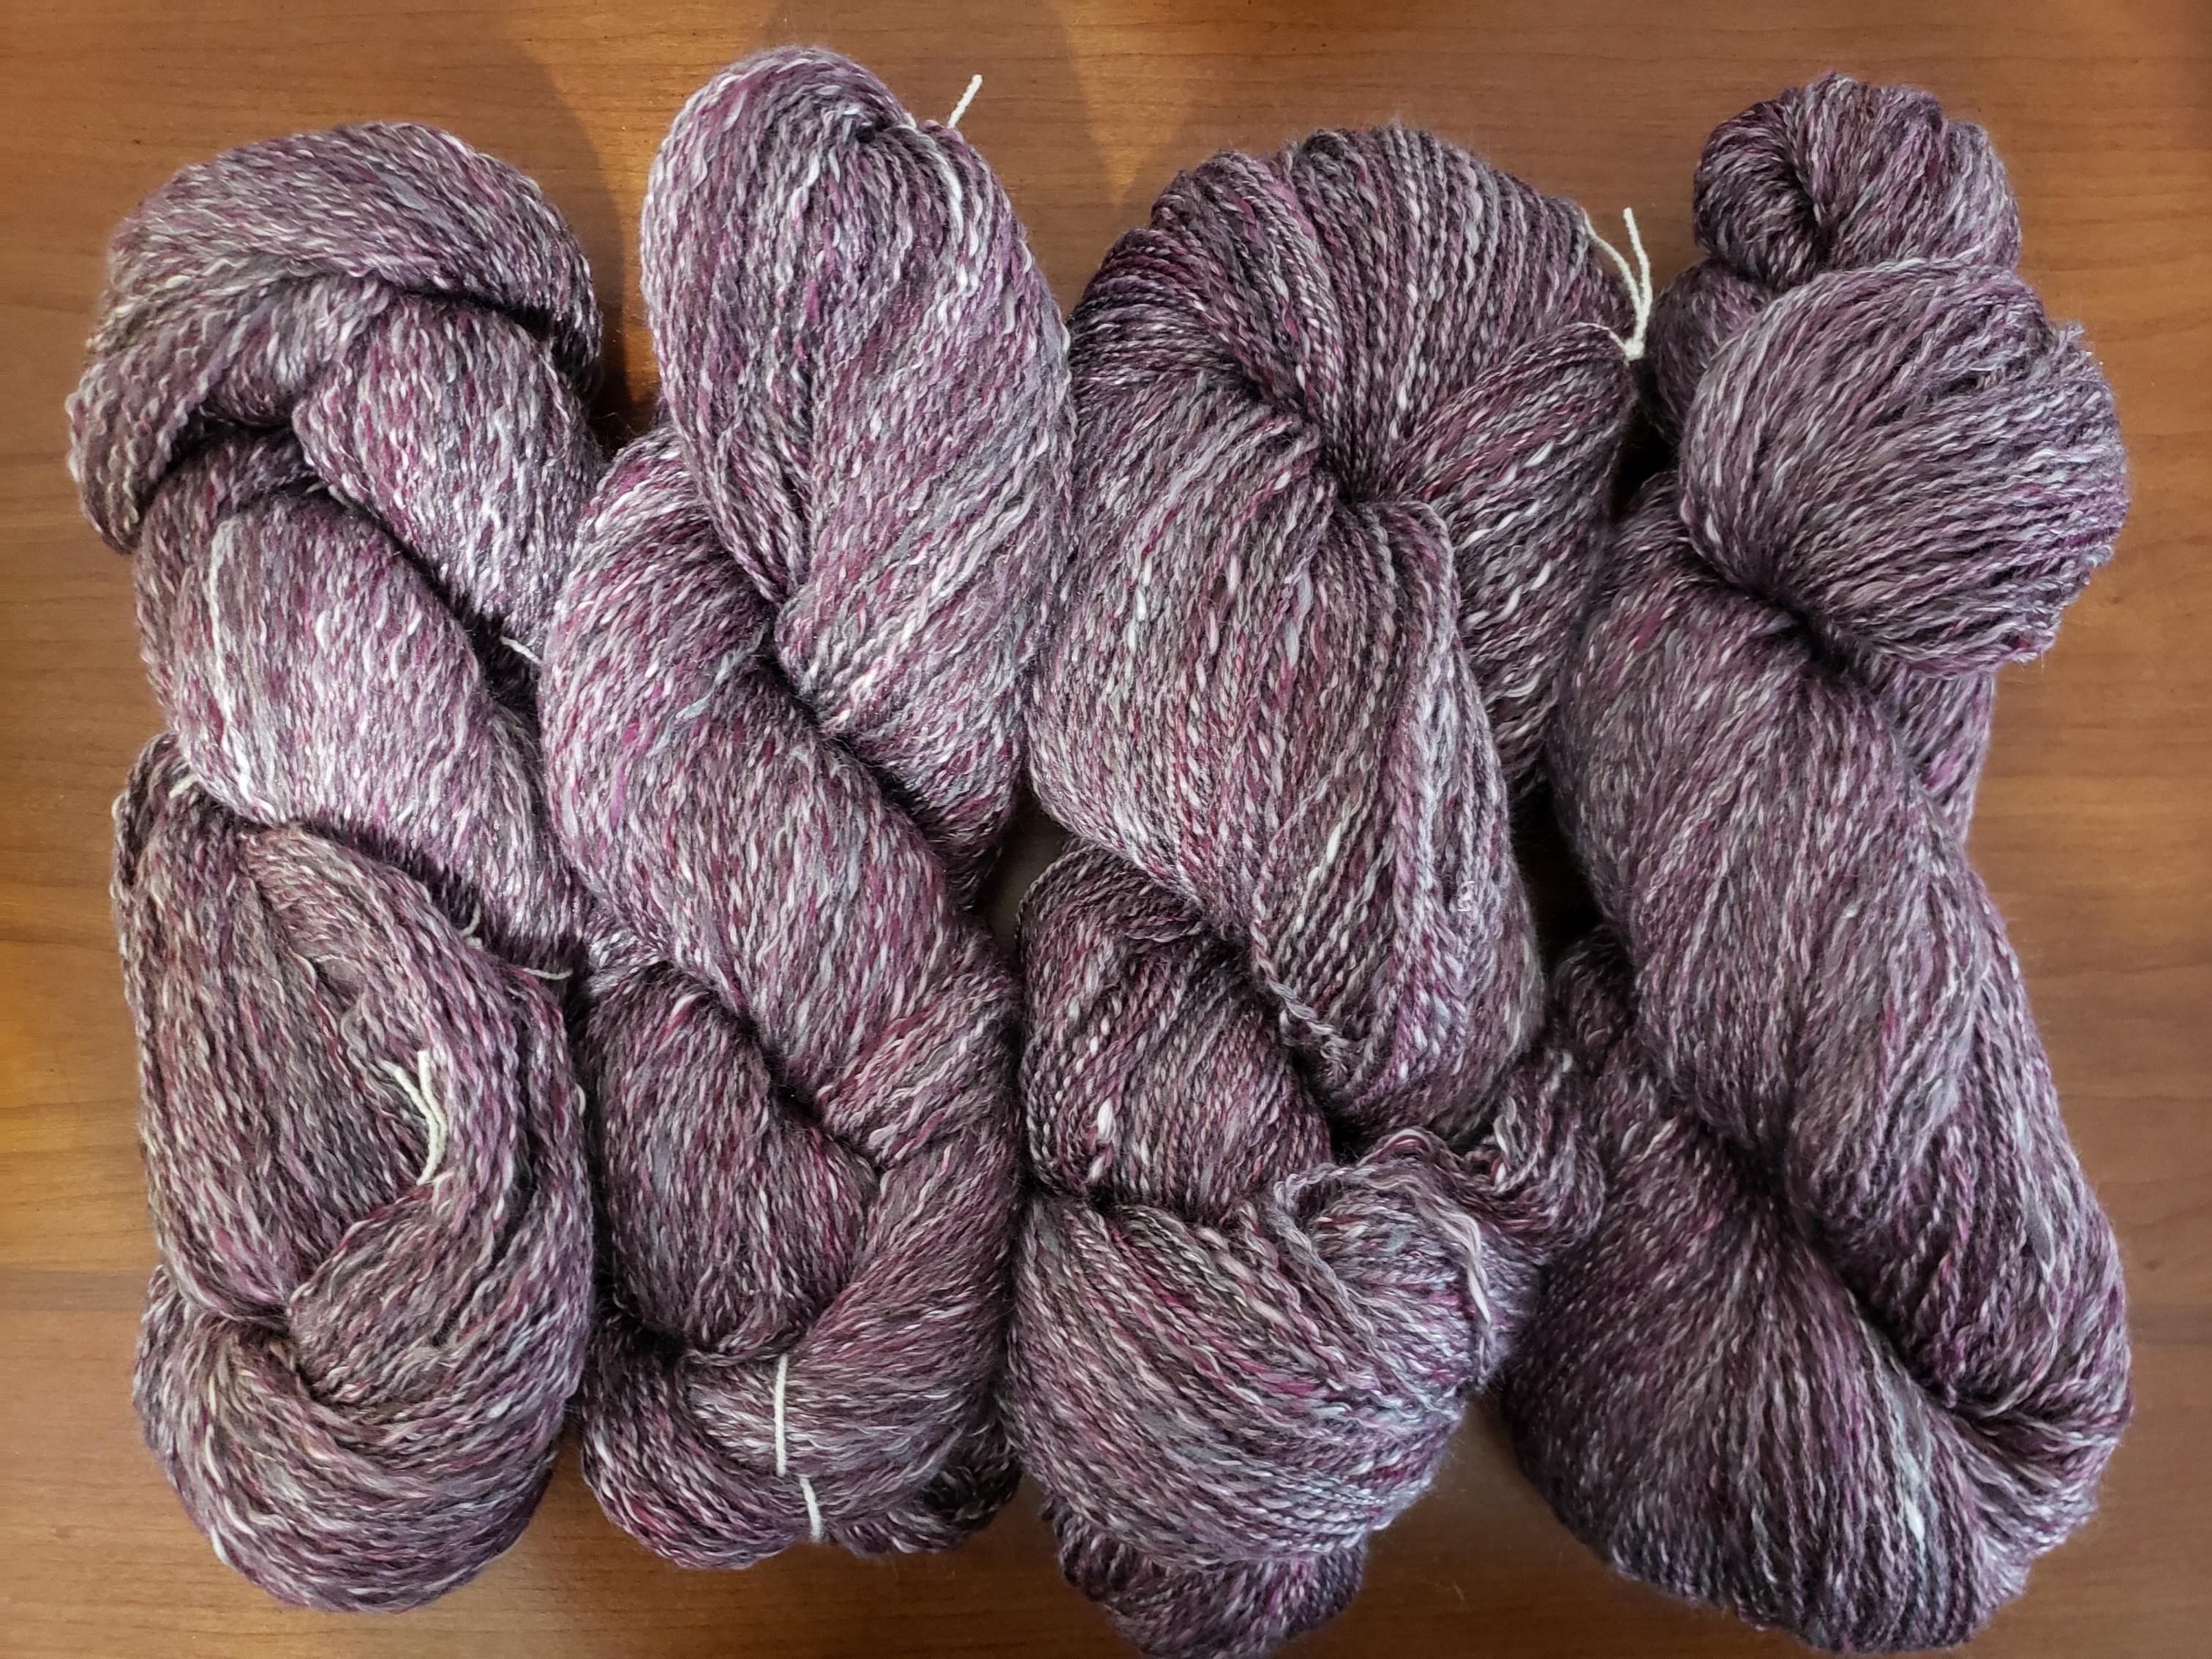 Birthe - Ashford Storm merino/silk handspun yarn.